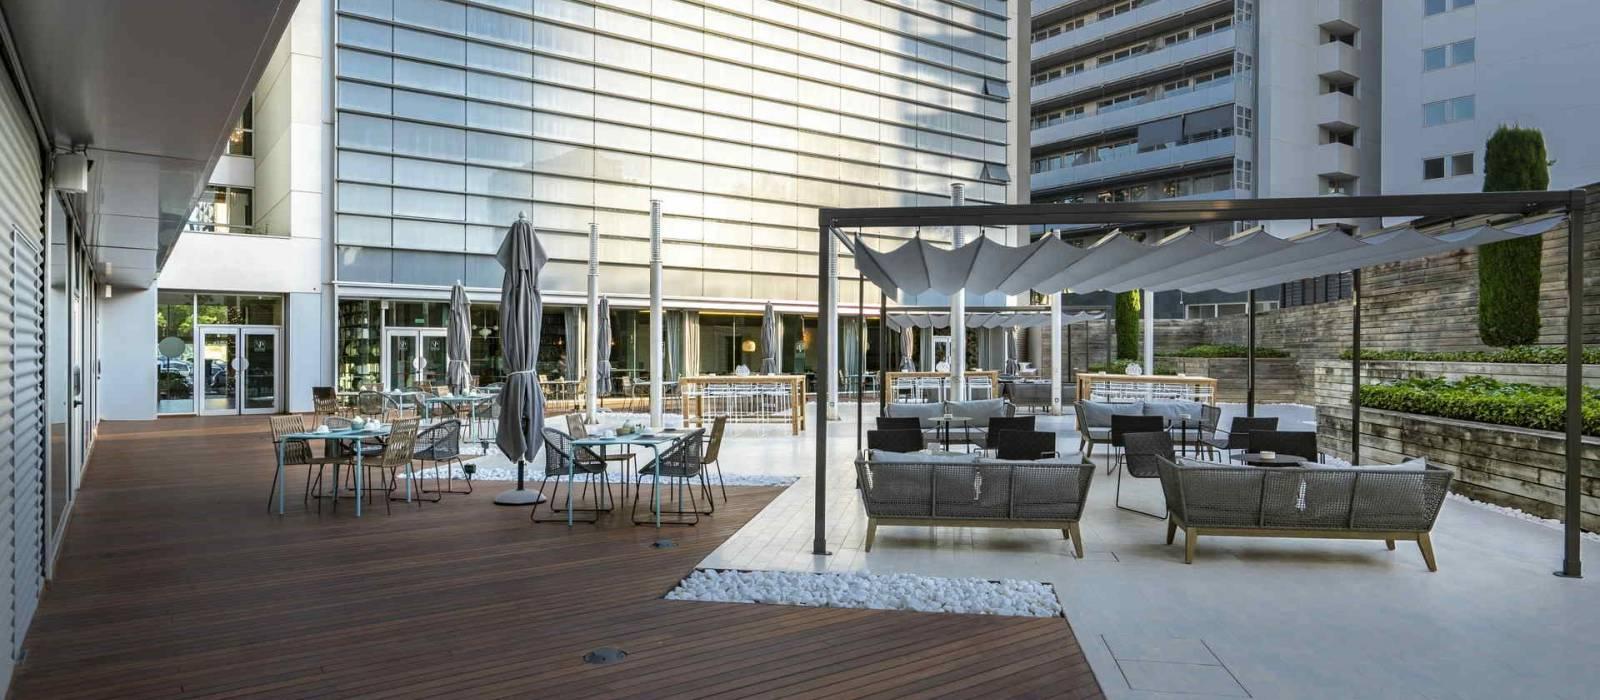 Hôtel Barcelona Marítimo Services 3 - Vincci Hotels - Terrasse Jardí de Mar